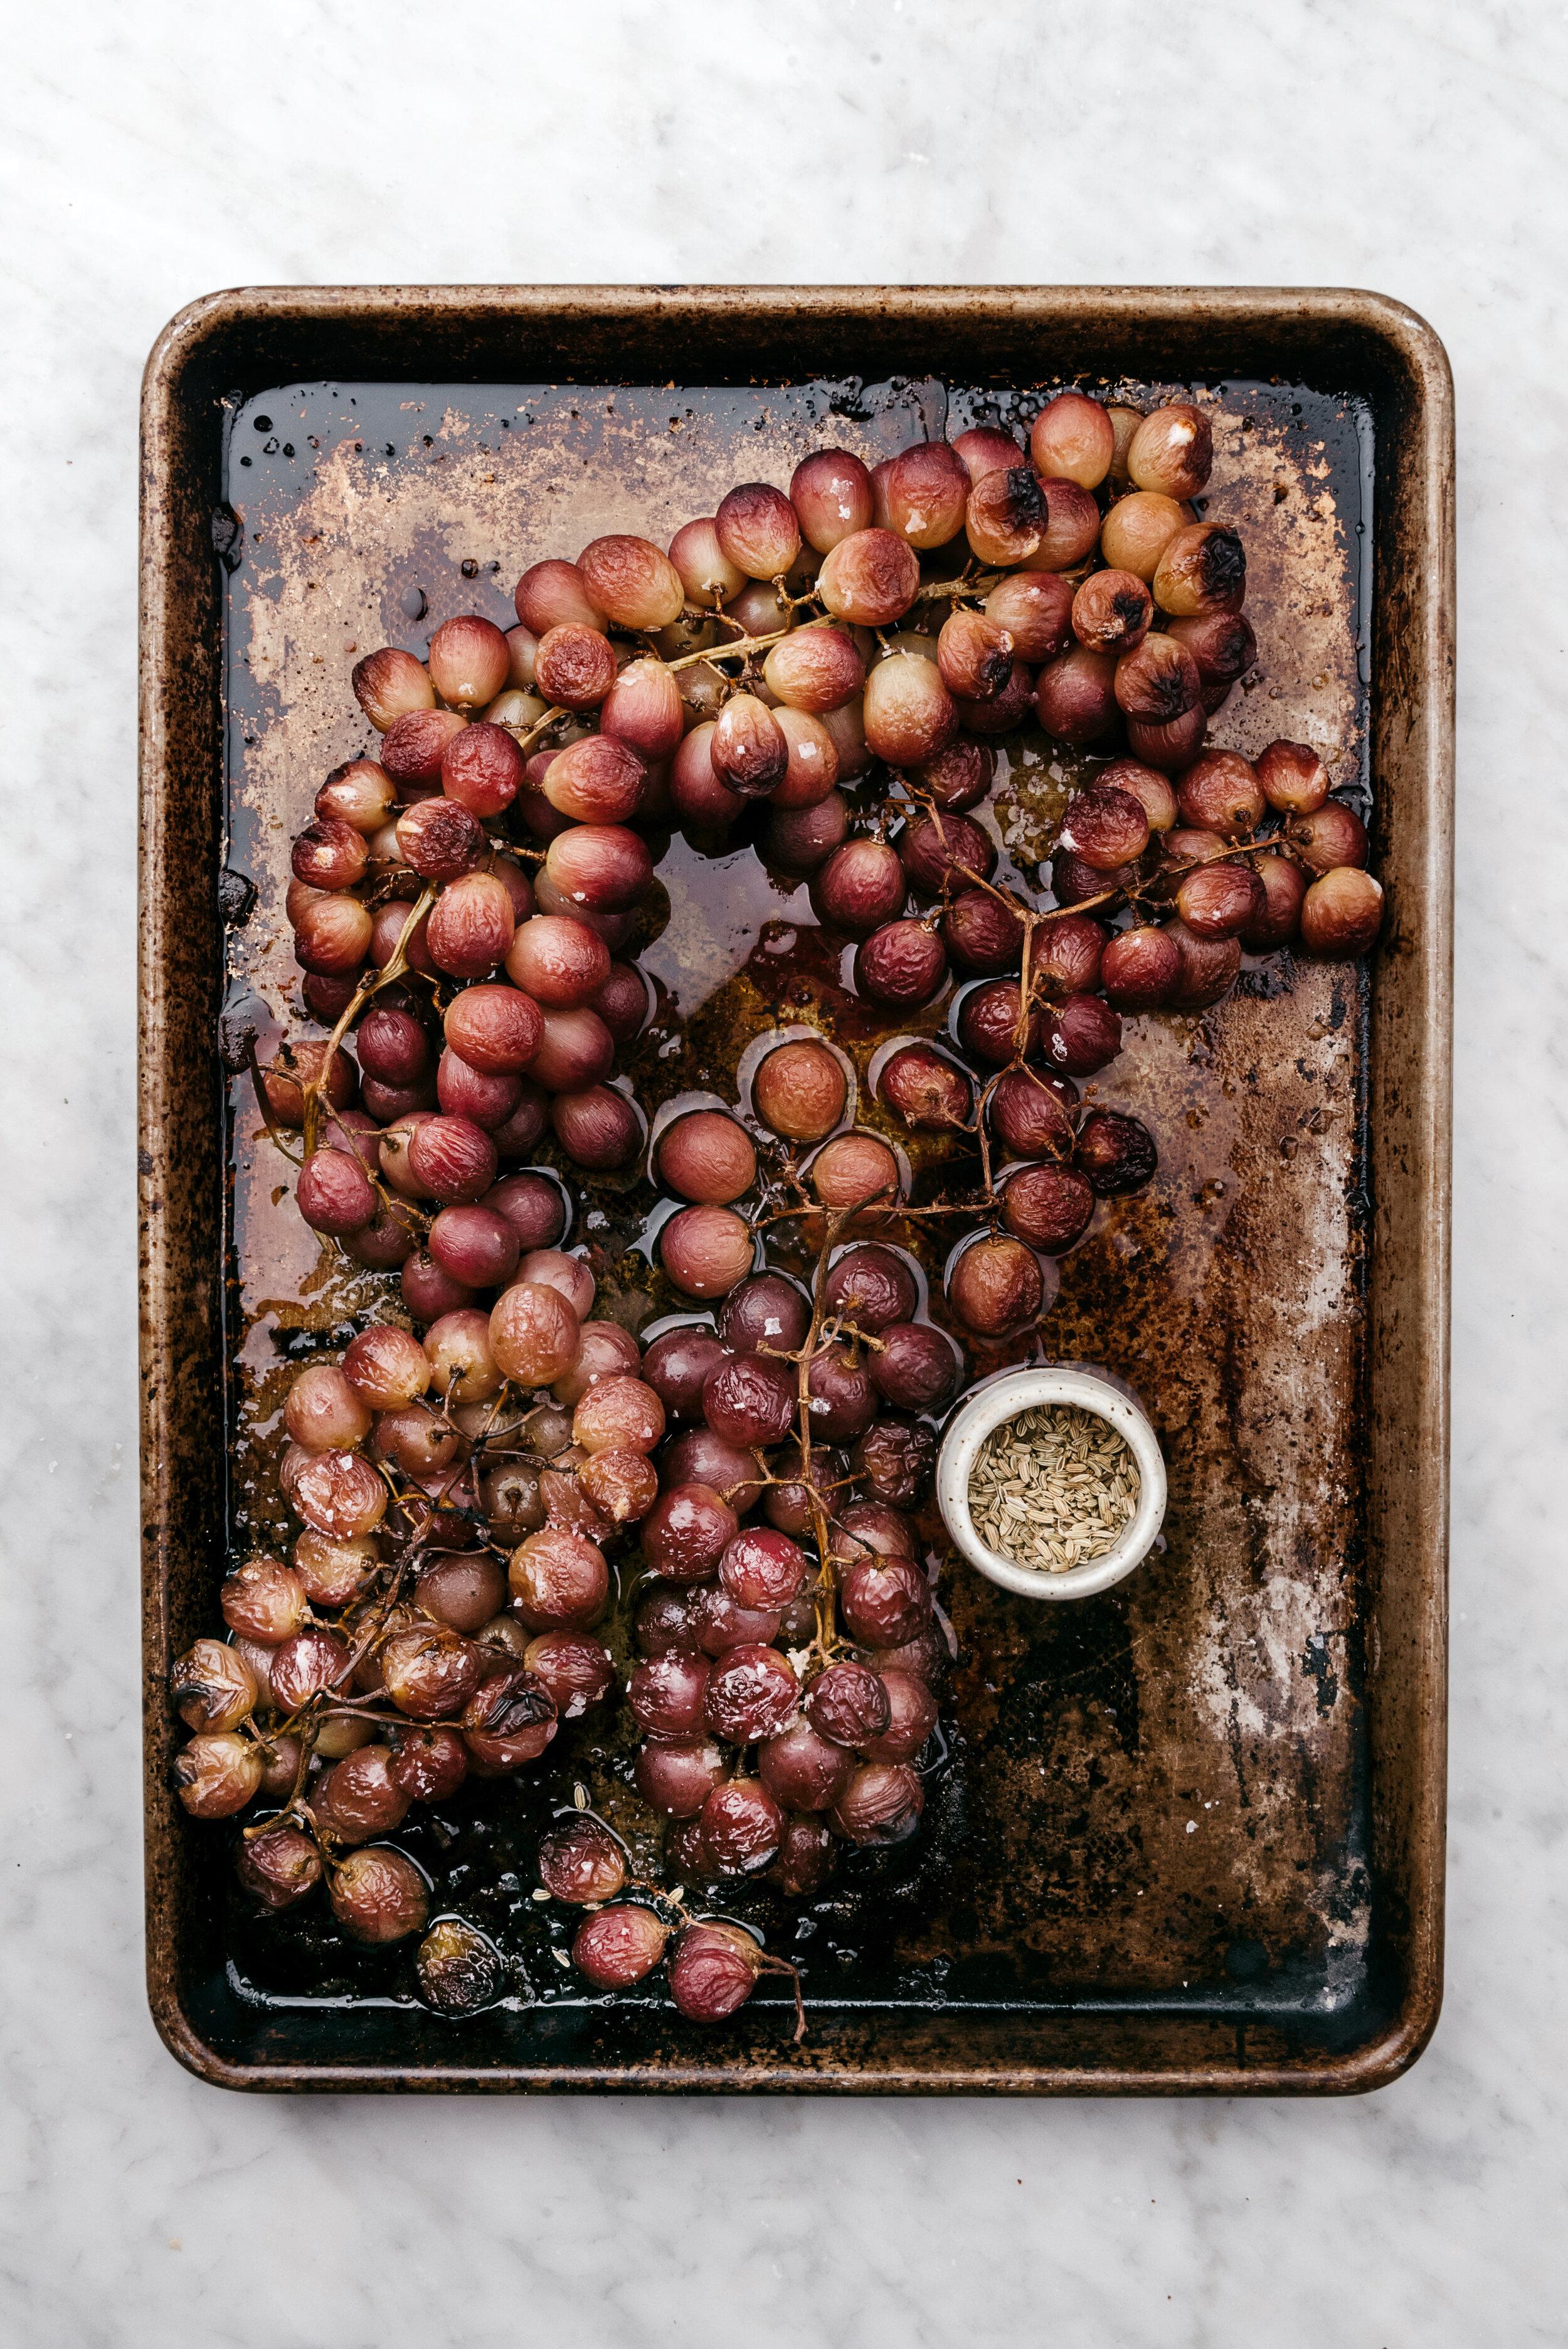 FENNEL ROASTED GRAPES #fallfruits #grapes #fennel  #sarahcopeland